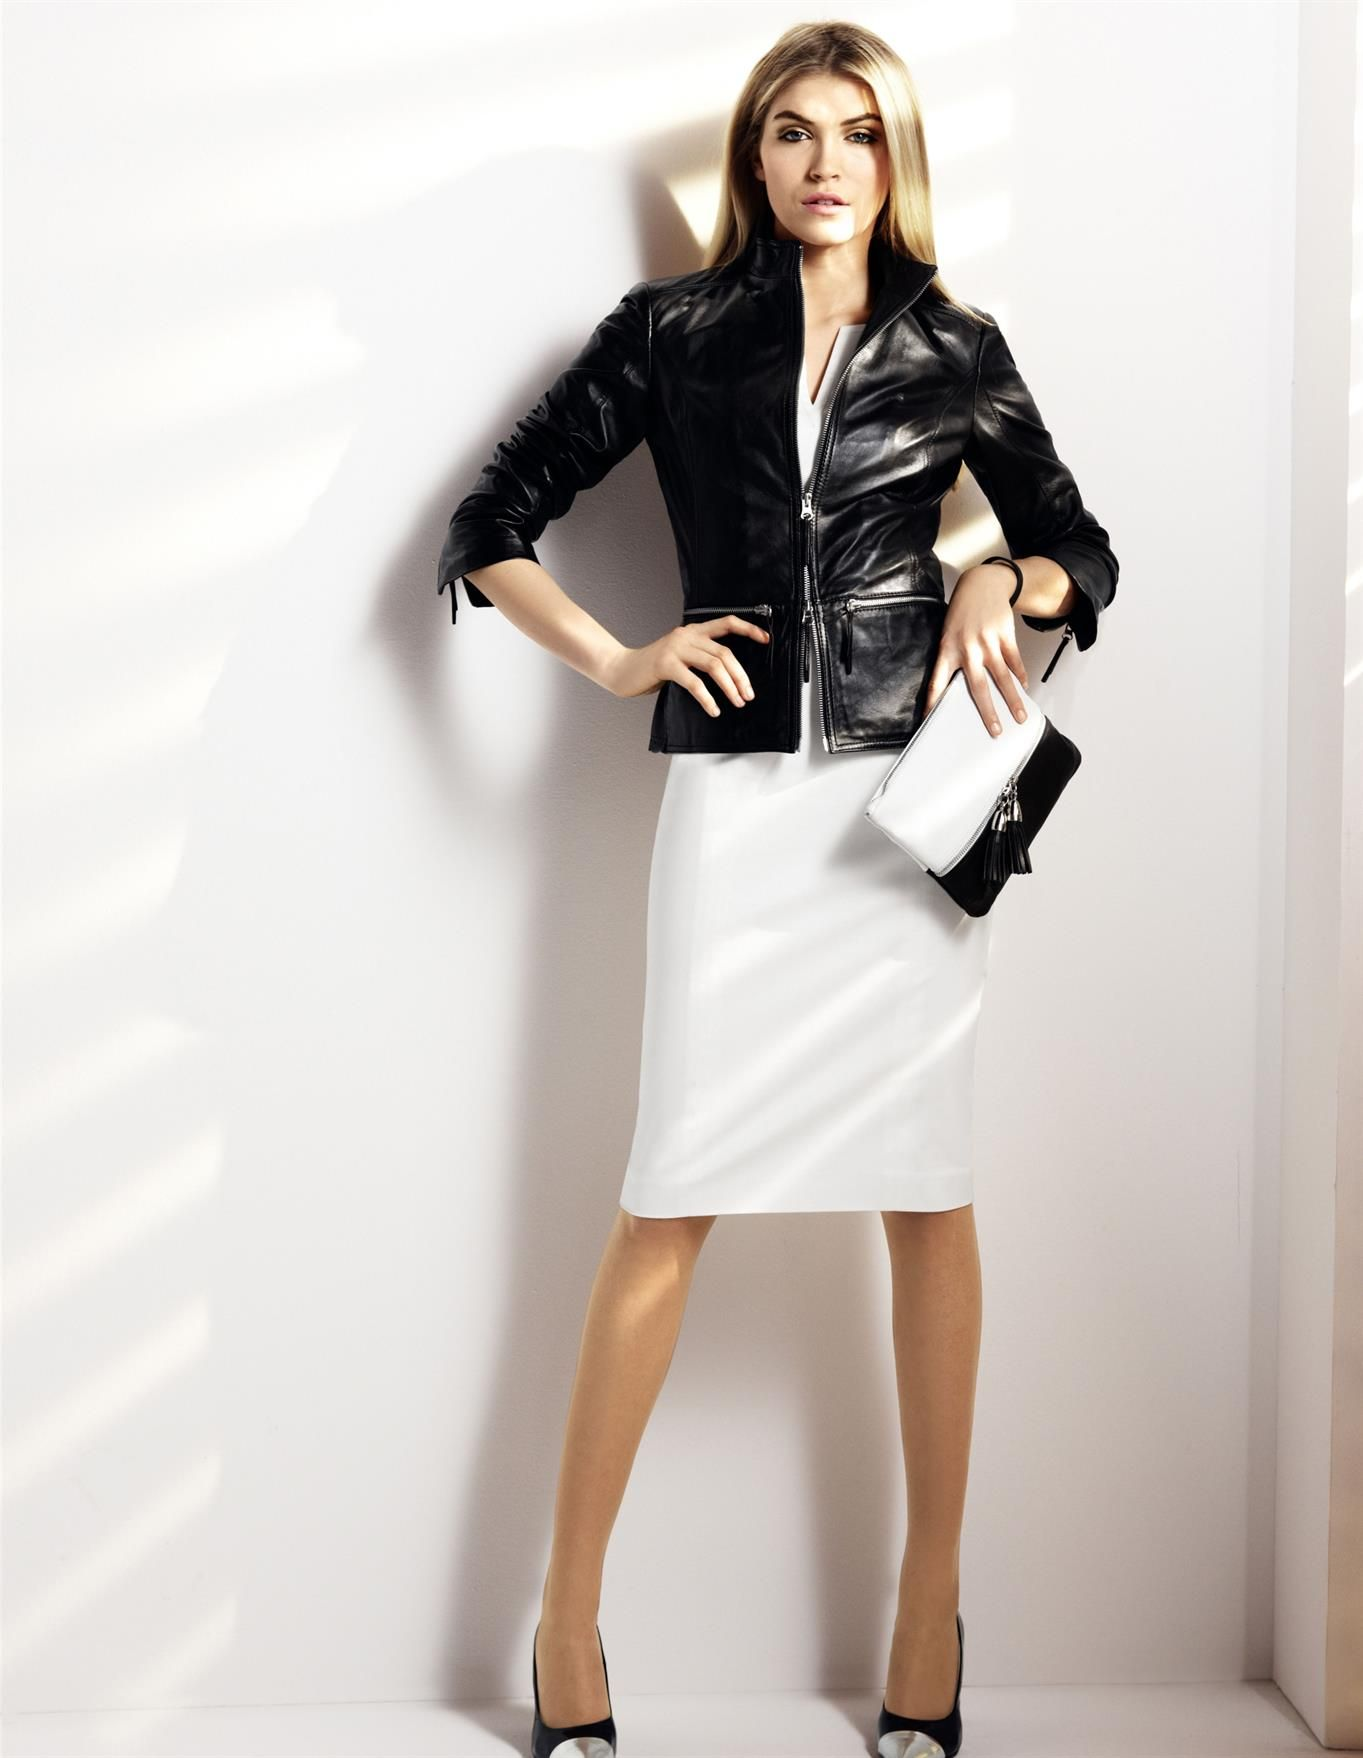 MADELEINE - Kleid, Lederjacke. Lammnappa, Tasche, Pumps  Mode